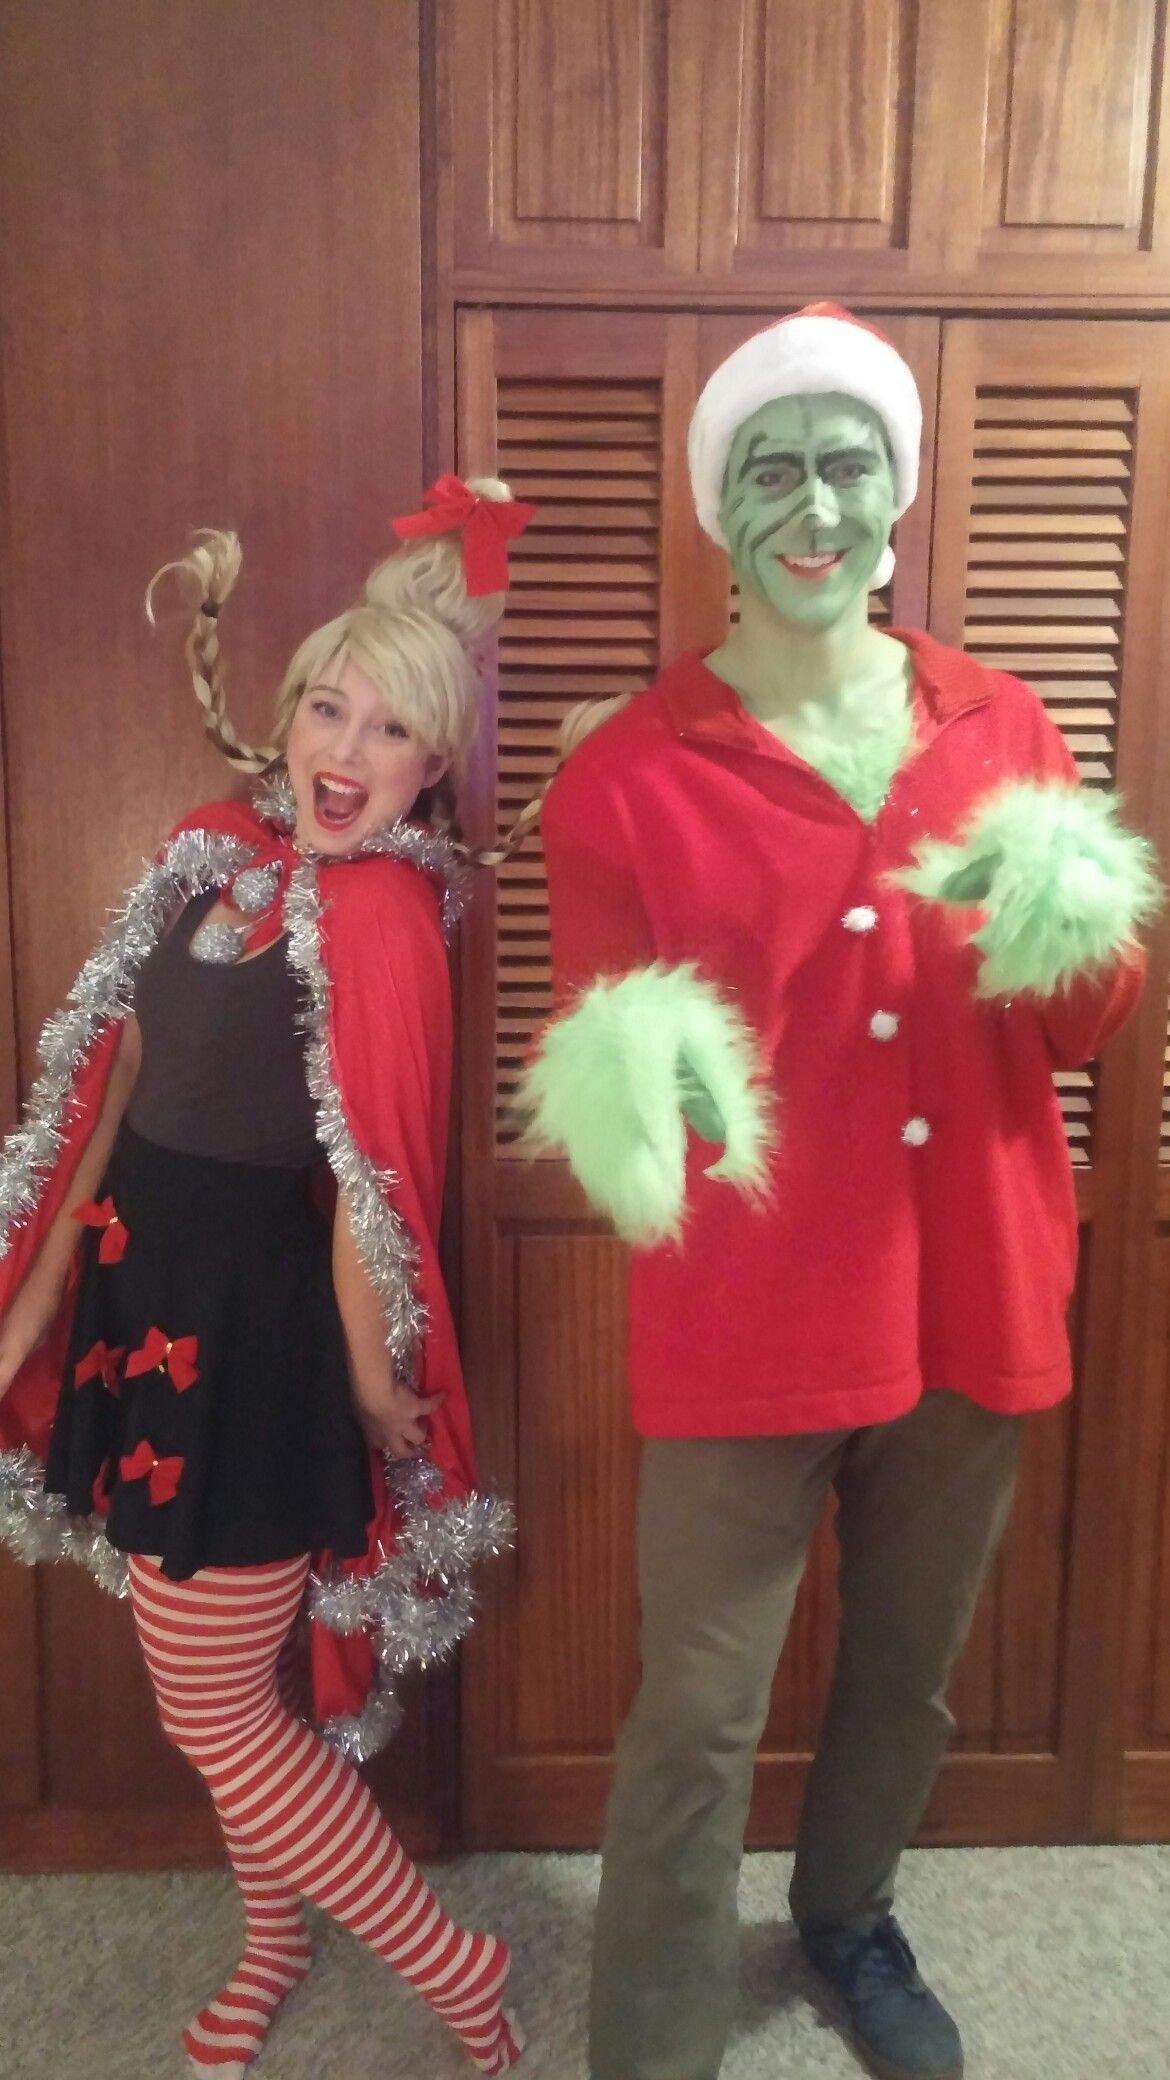 10 Stylish Cindy Lou Who Costume Ideas cindy lou who and the grinch diy halloween costumebradie jackson